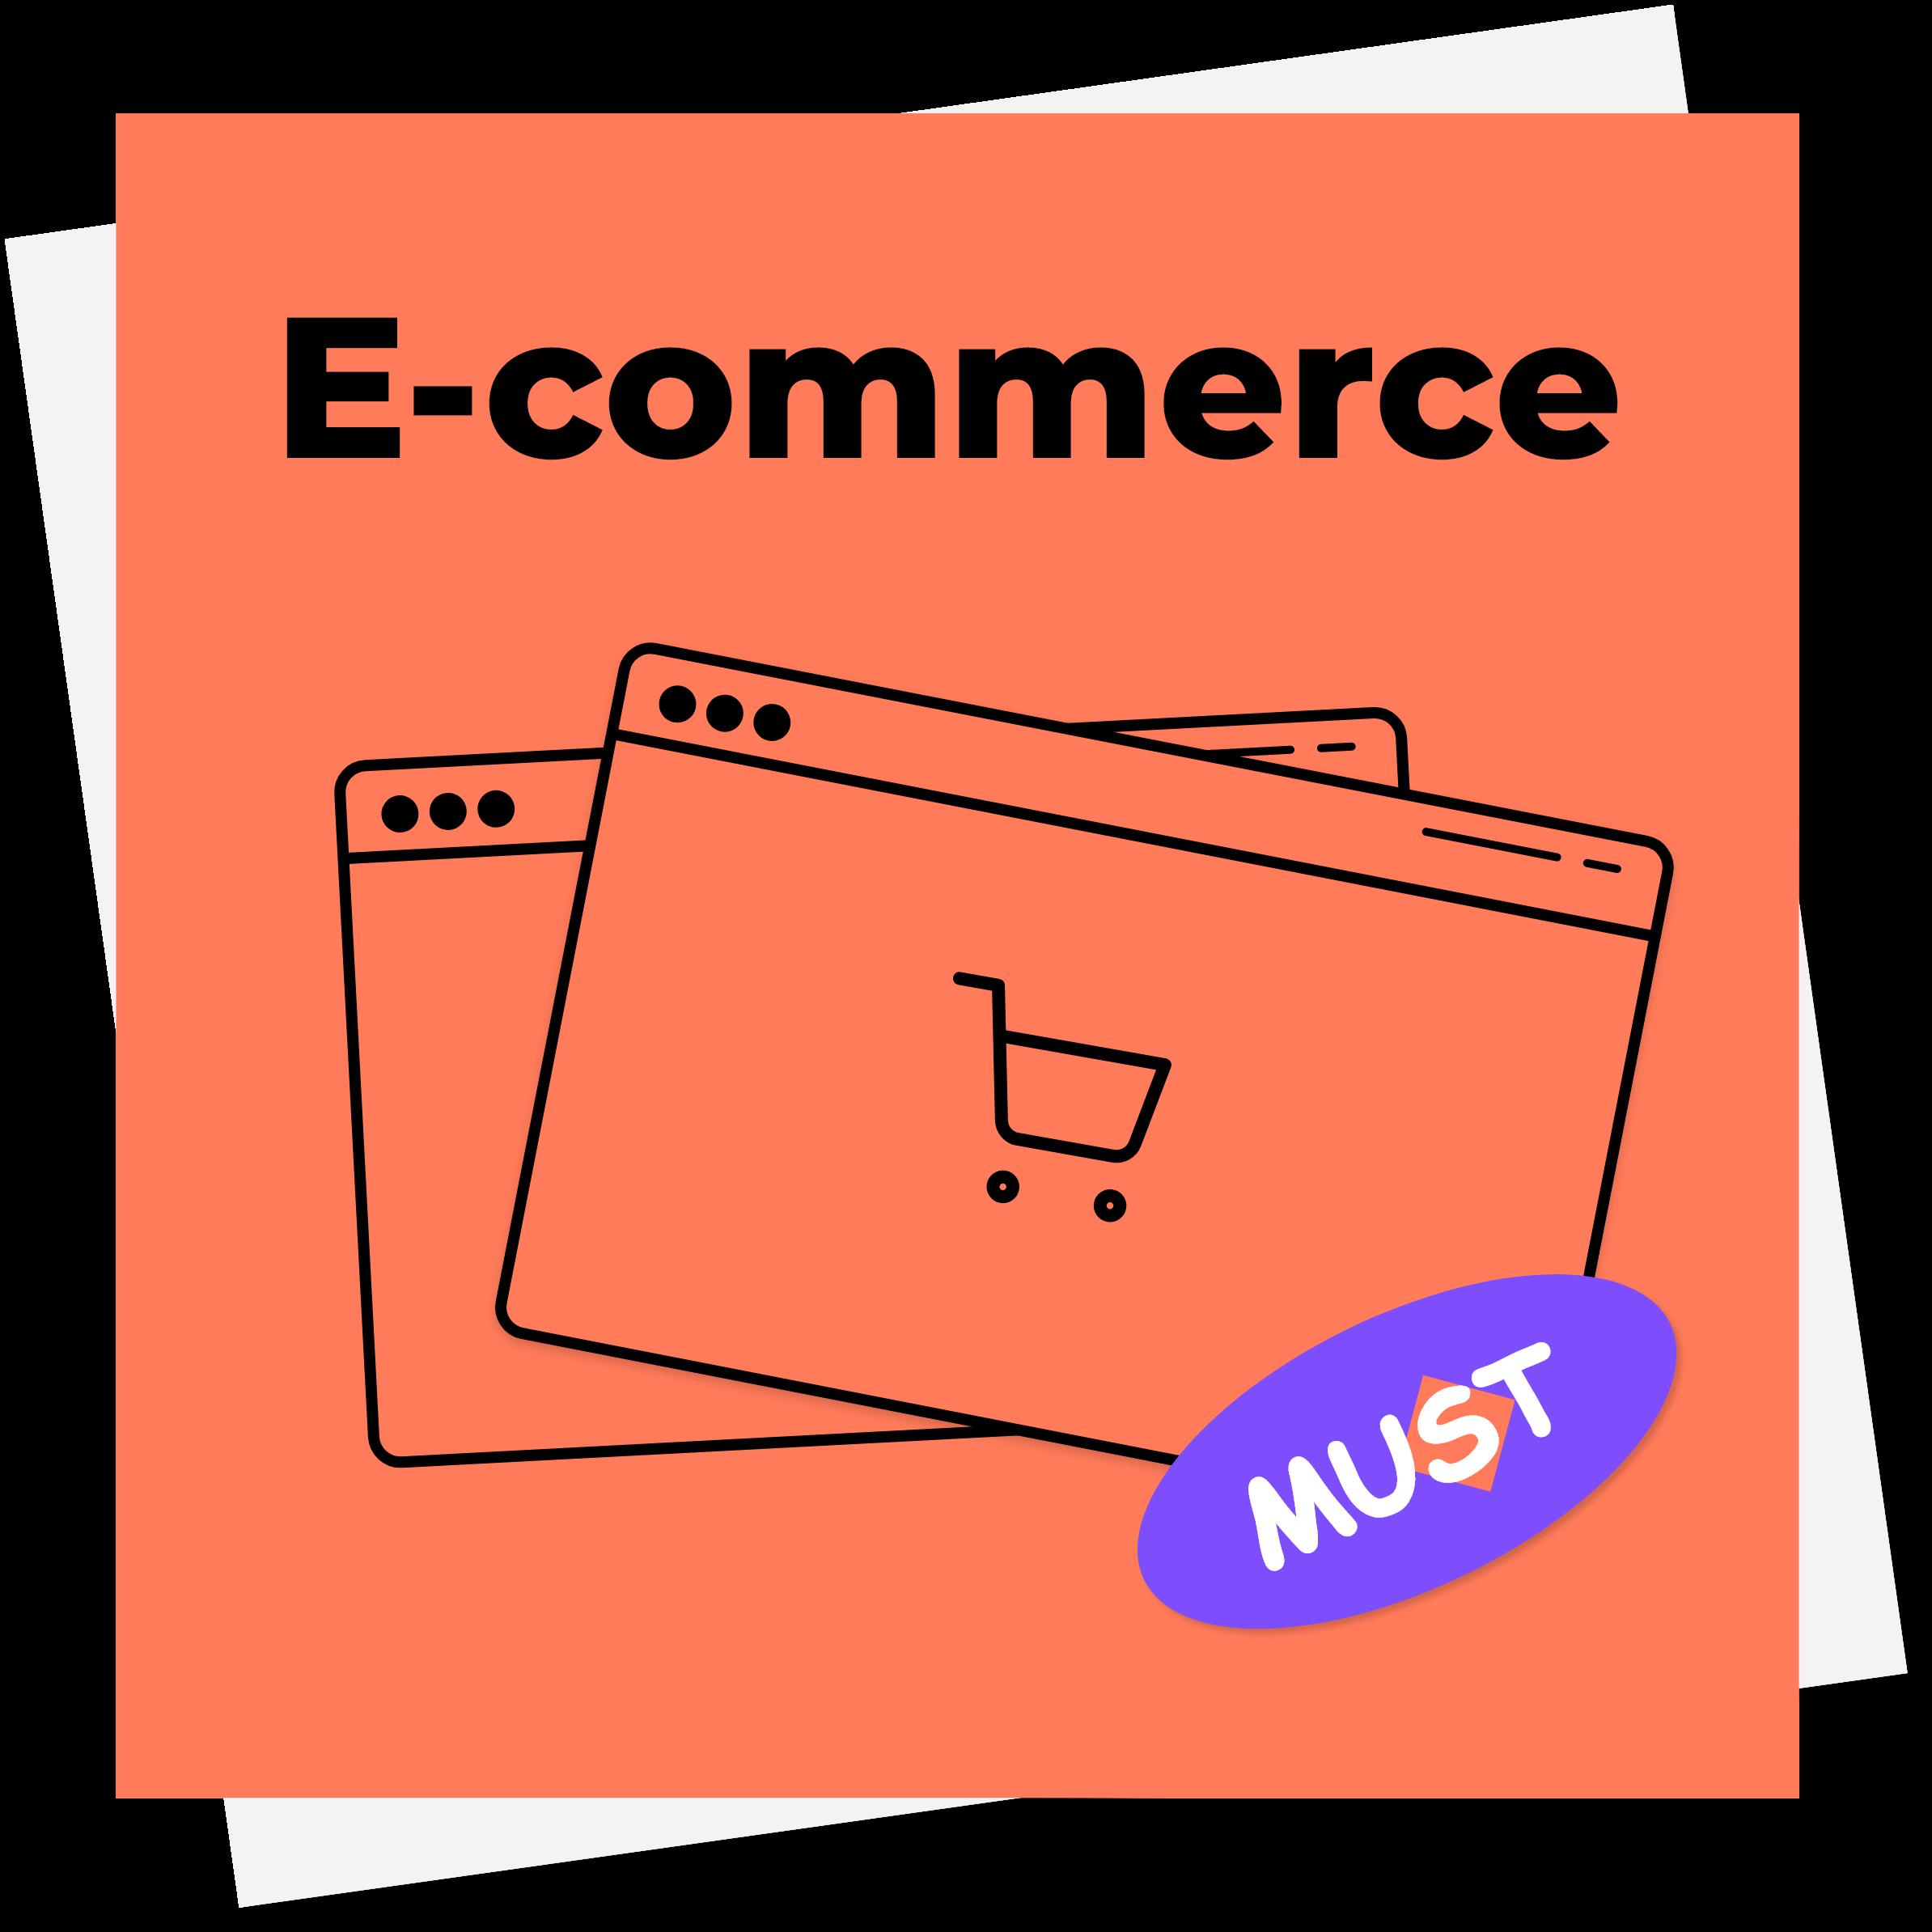 El momento del e-commerce de ámbito local